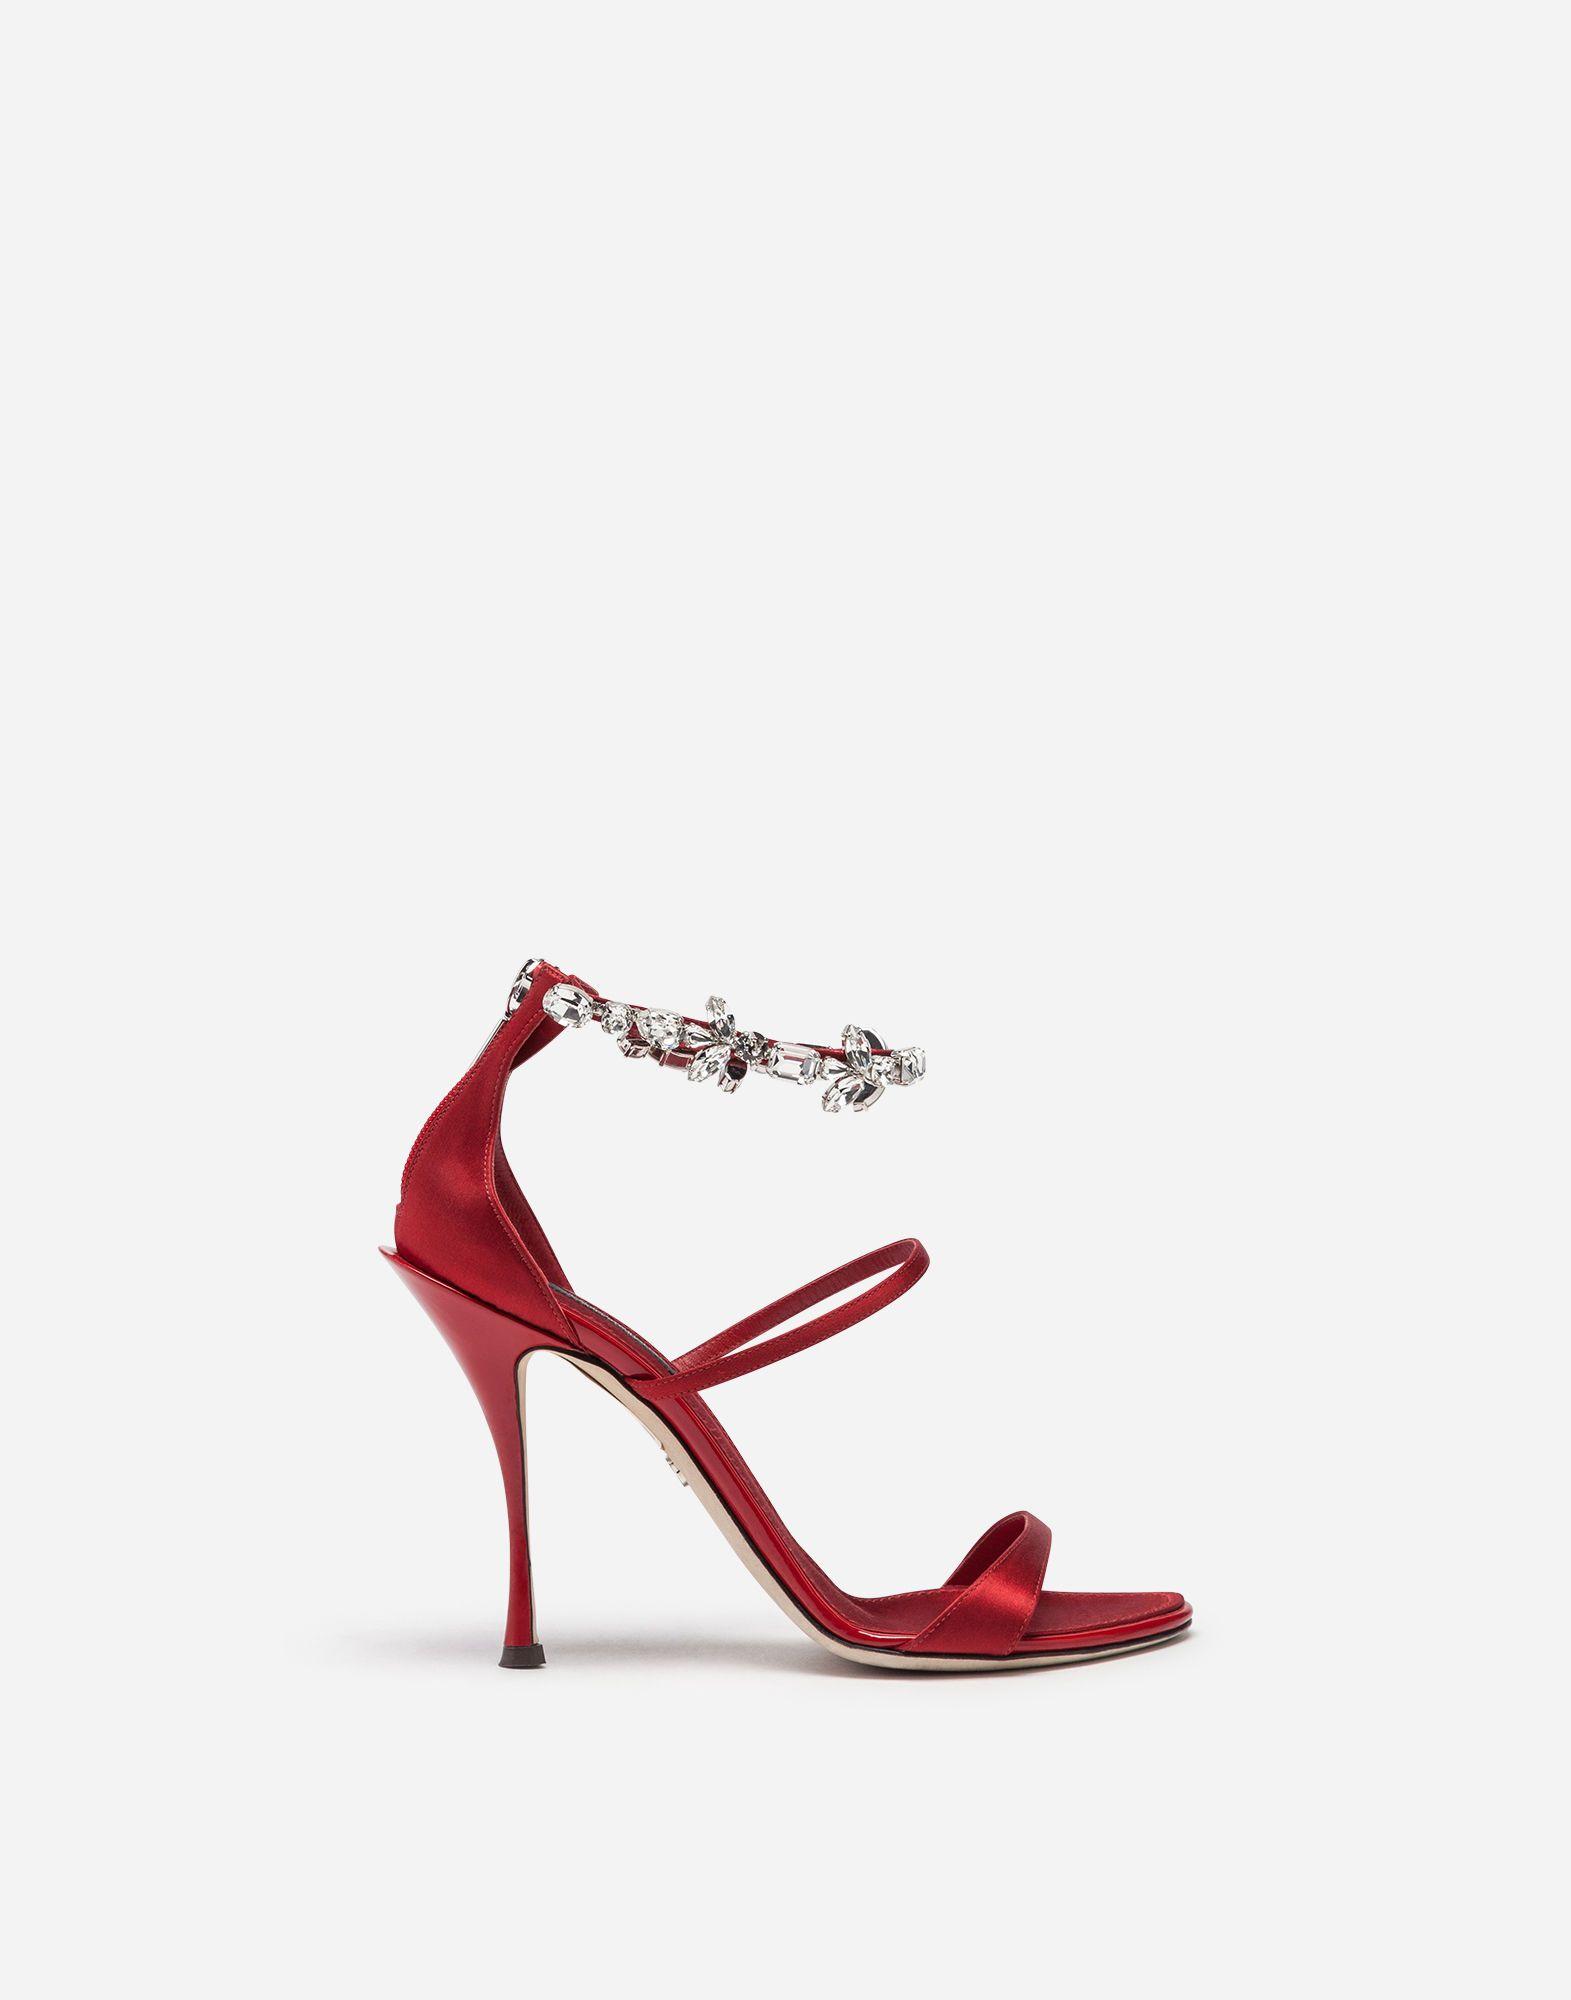 Shoesgladiador Owx8n0pk Price Sandalias Shoes Caballero qSzMGULpV